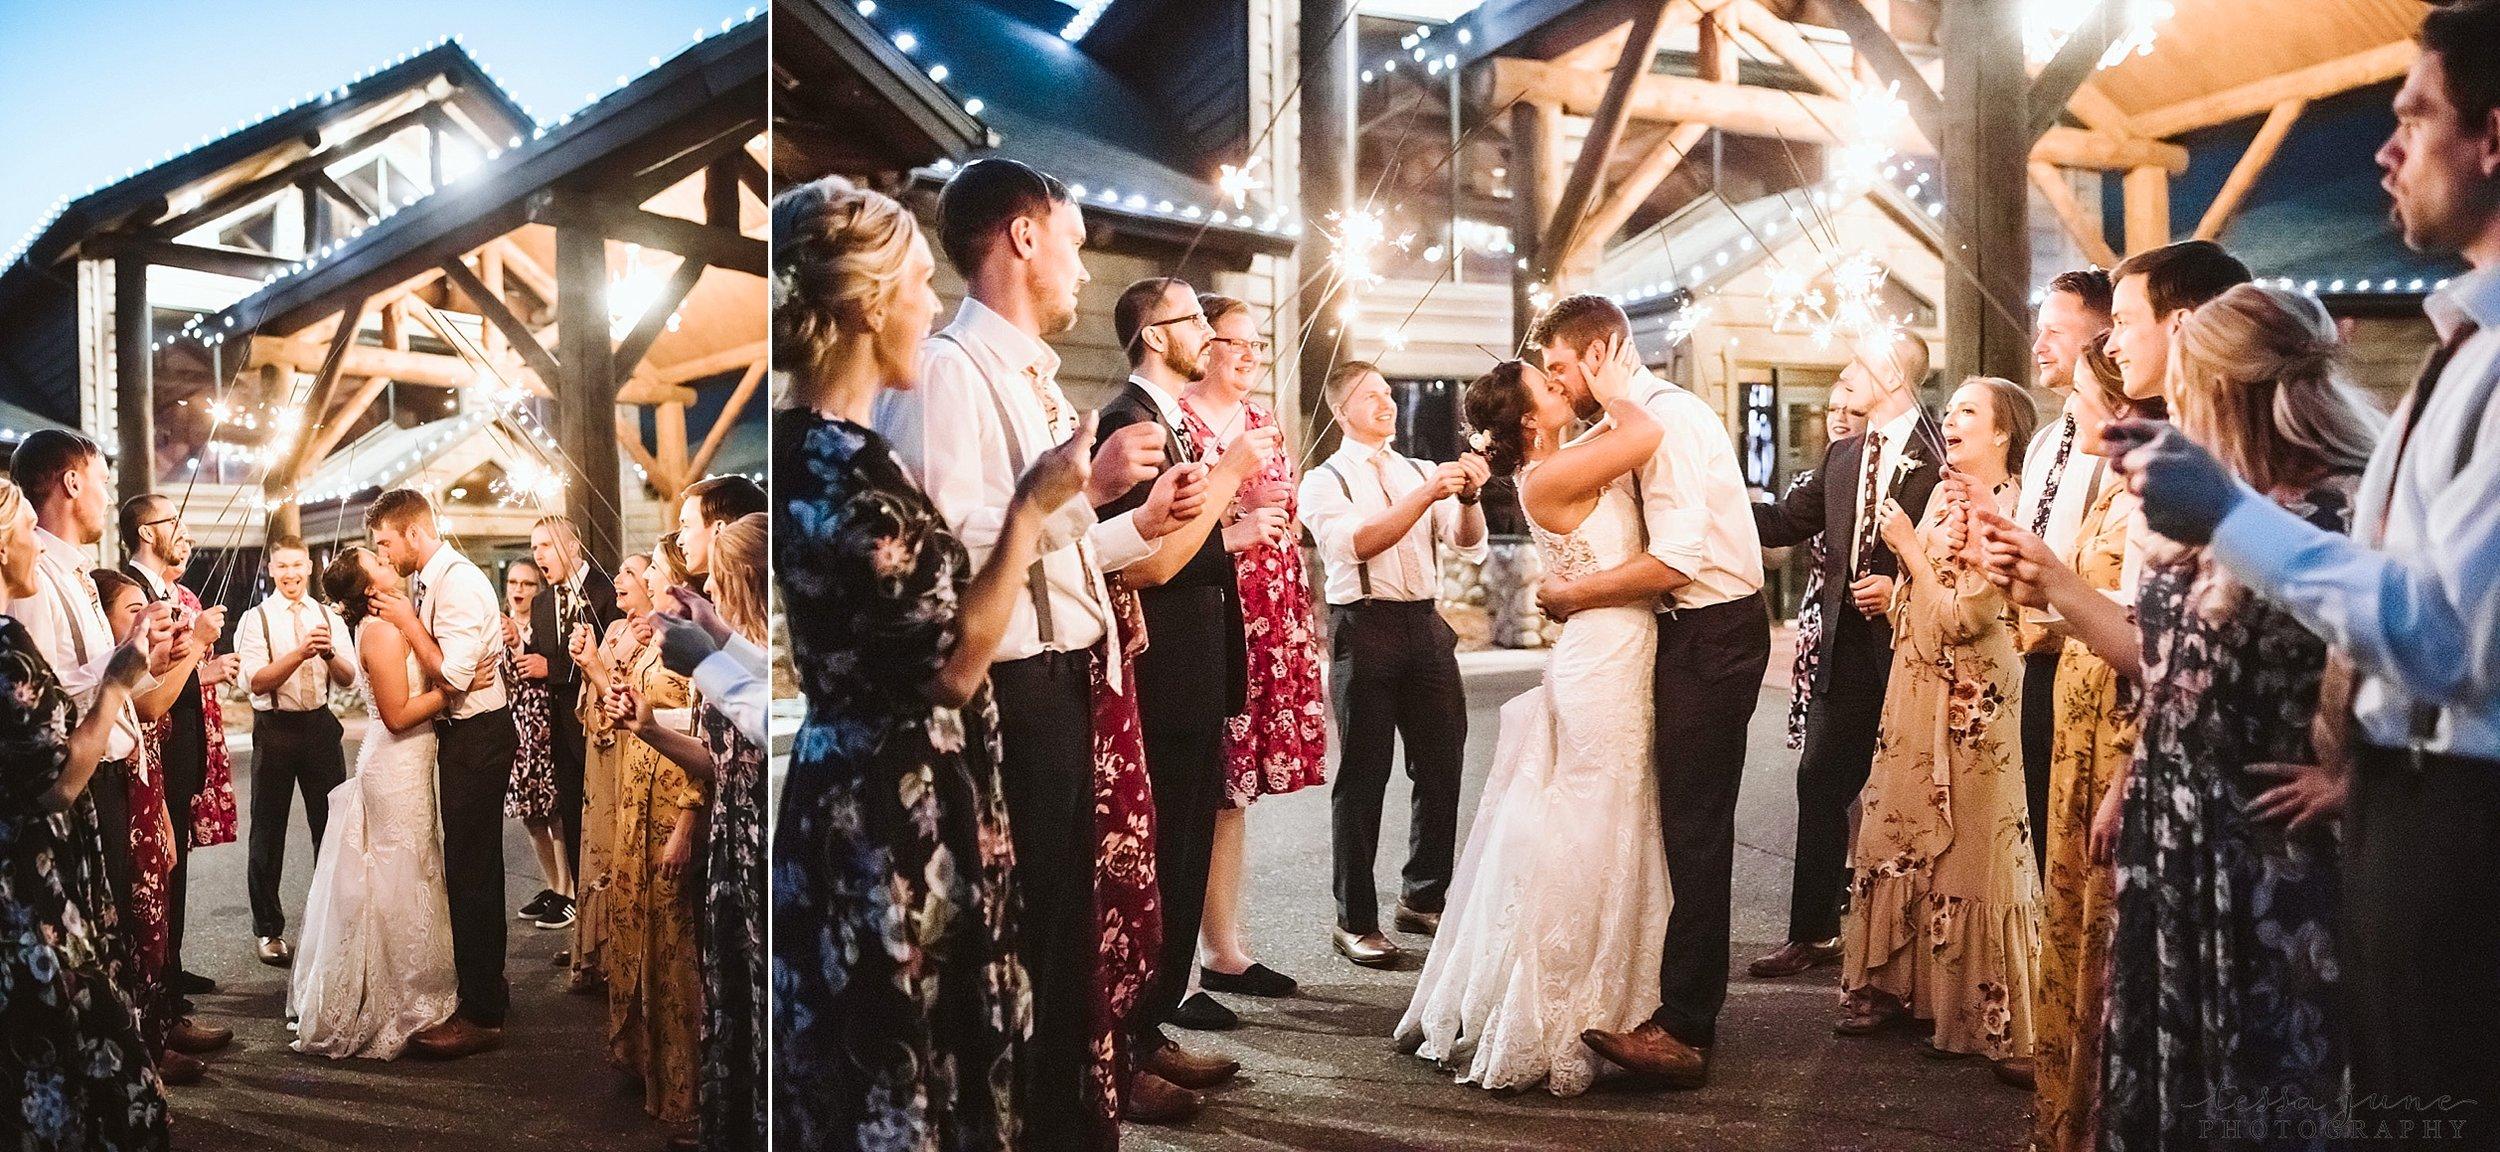 The-grands-at-mulligans-wedding-sartell-minnesota-spring-floral-spring-garden-wedding-159.jpg